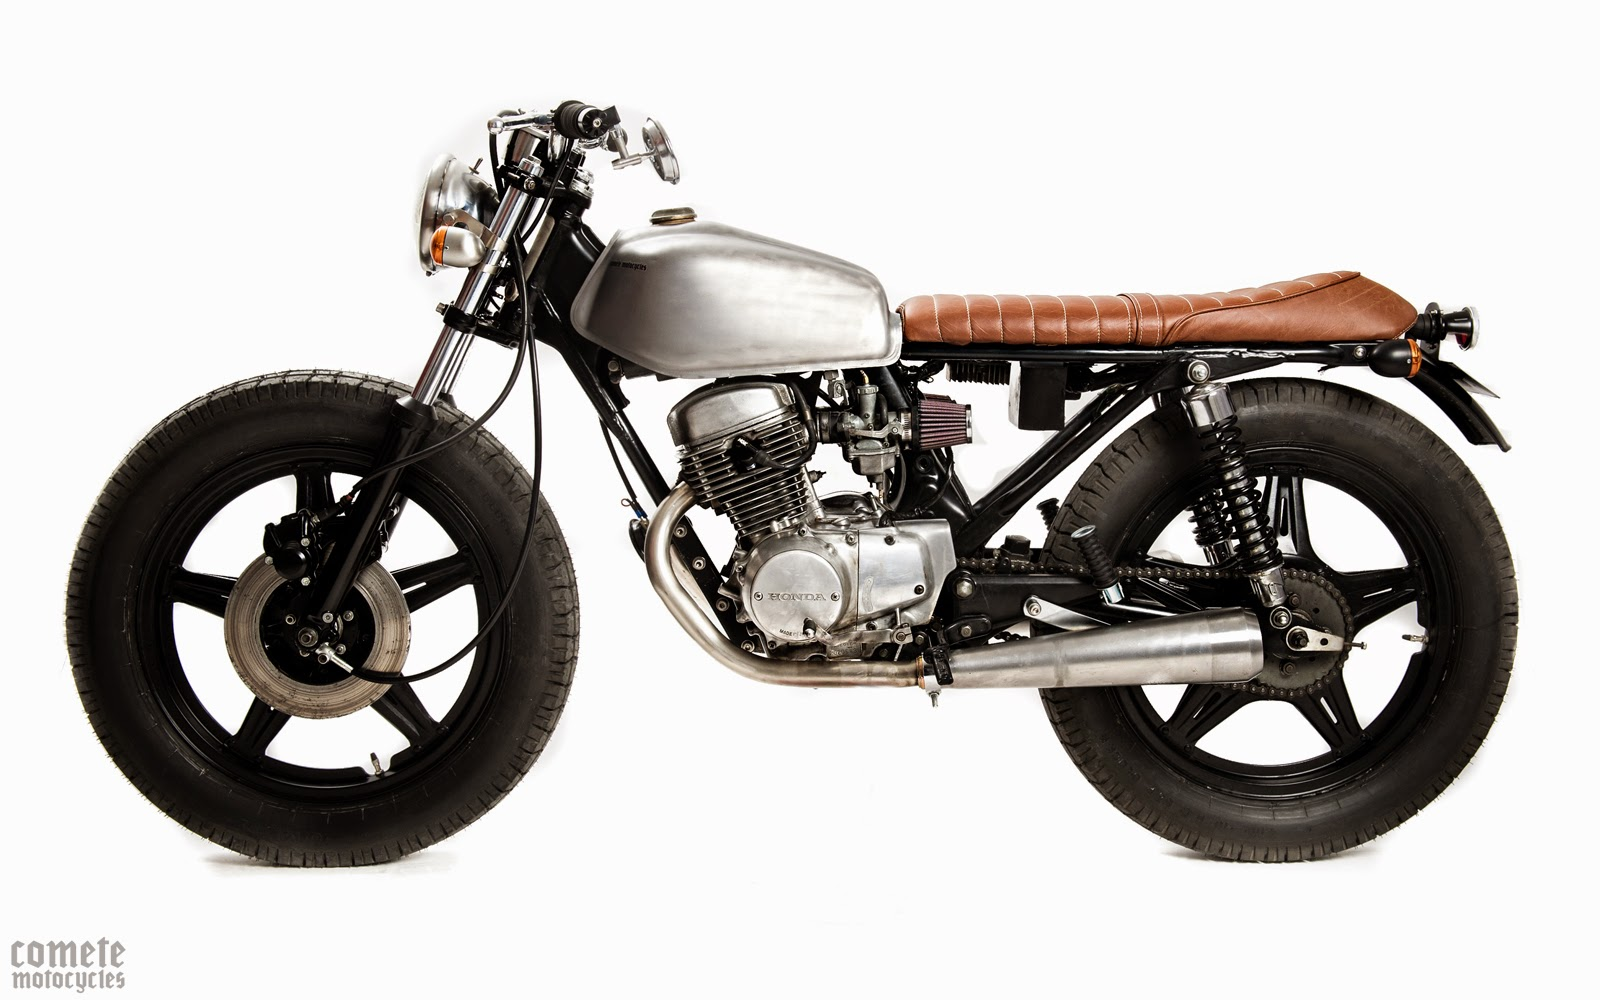 milchapitas kustom bikes honda cb125 twin 1980 by comete motorcycles. Black Bedroom Furniture Sets. Home Design Ideas